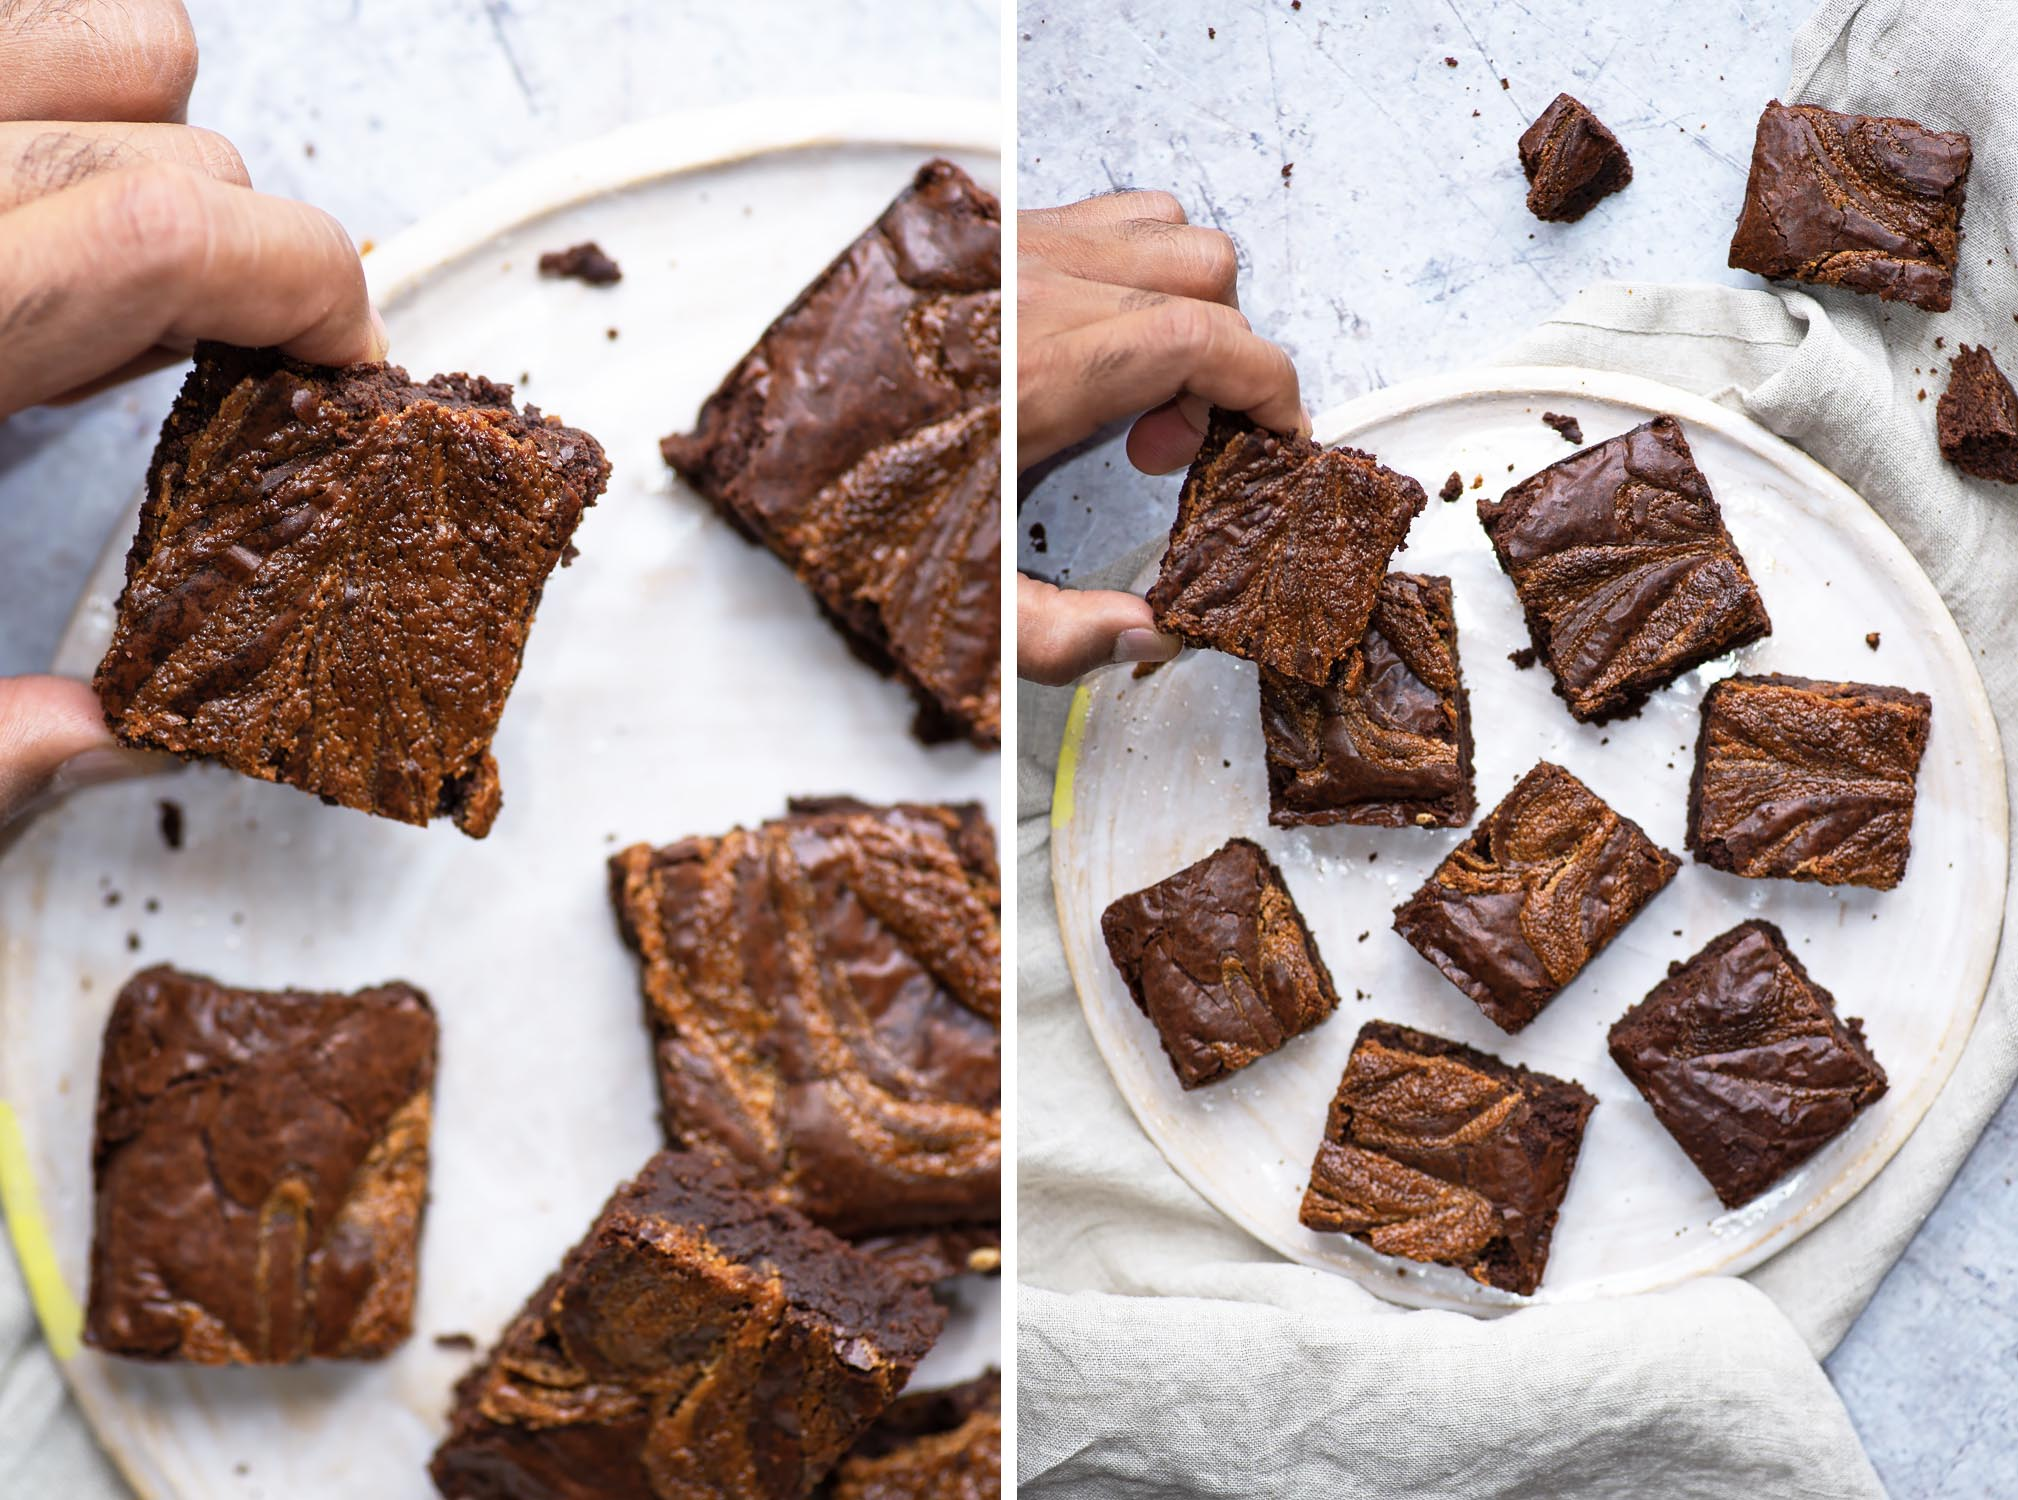 Flourless Dark Chocolate and Tahini Brownies (adapted from a David Lebovitz recipe) | Mondomulia